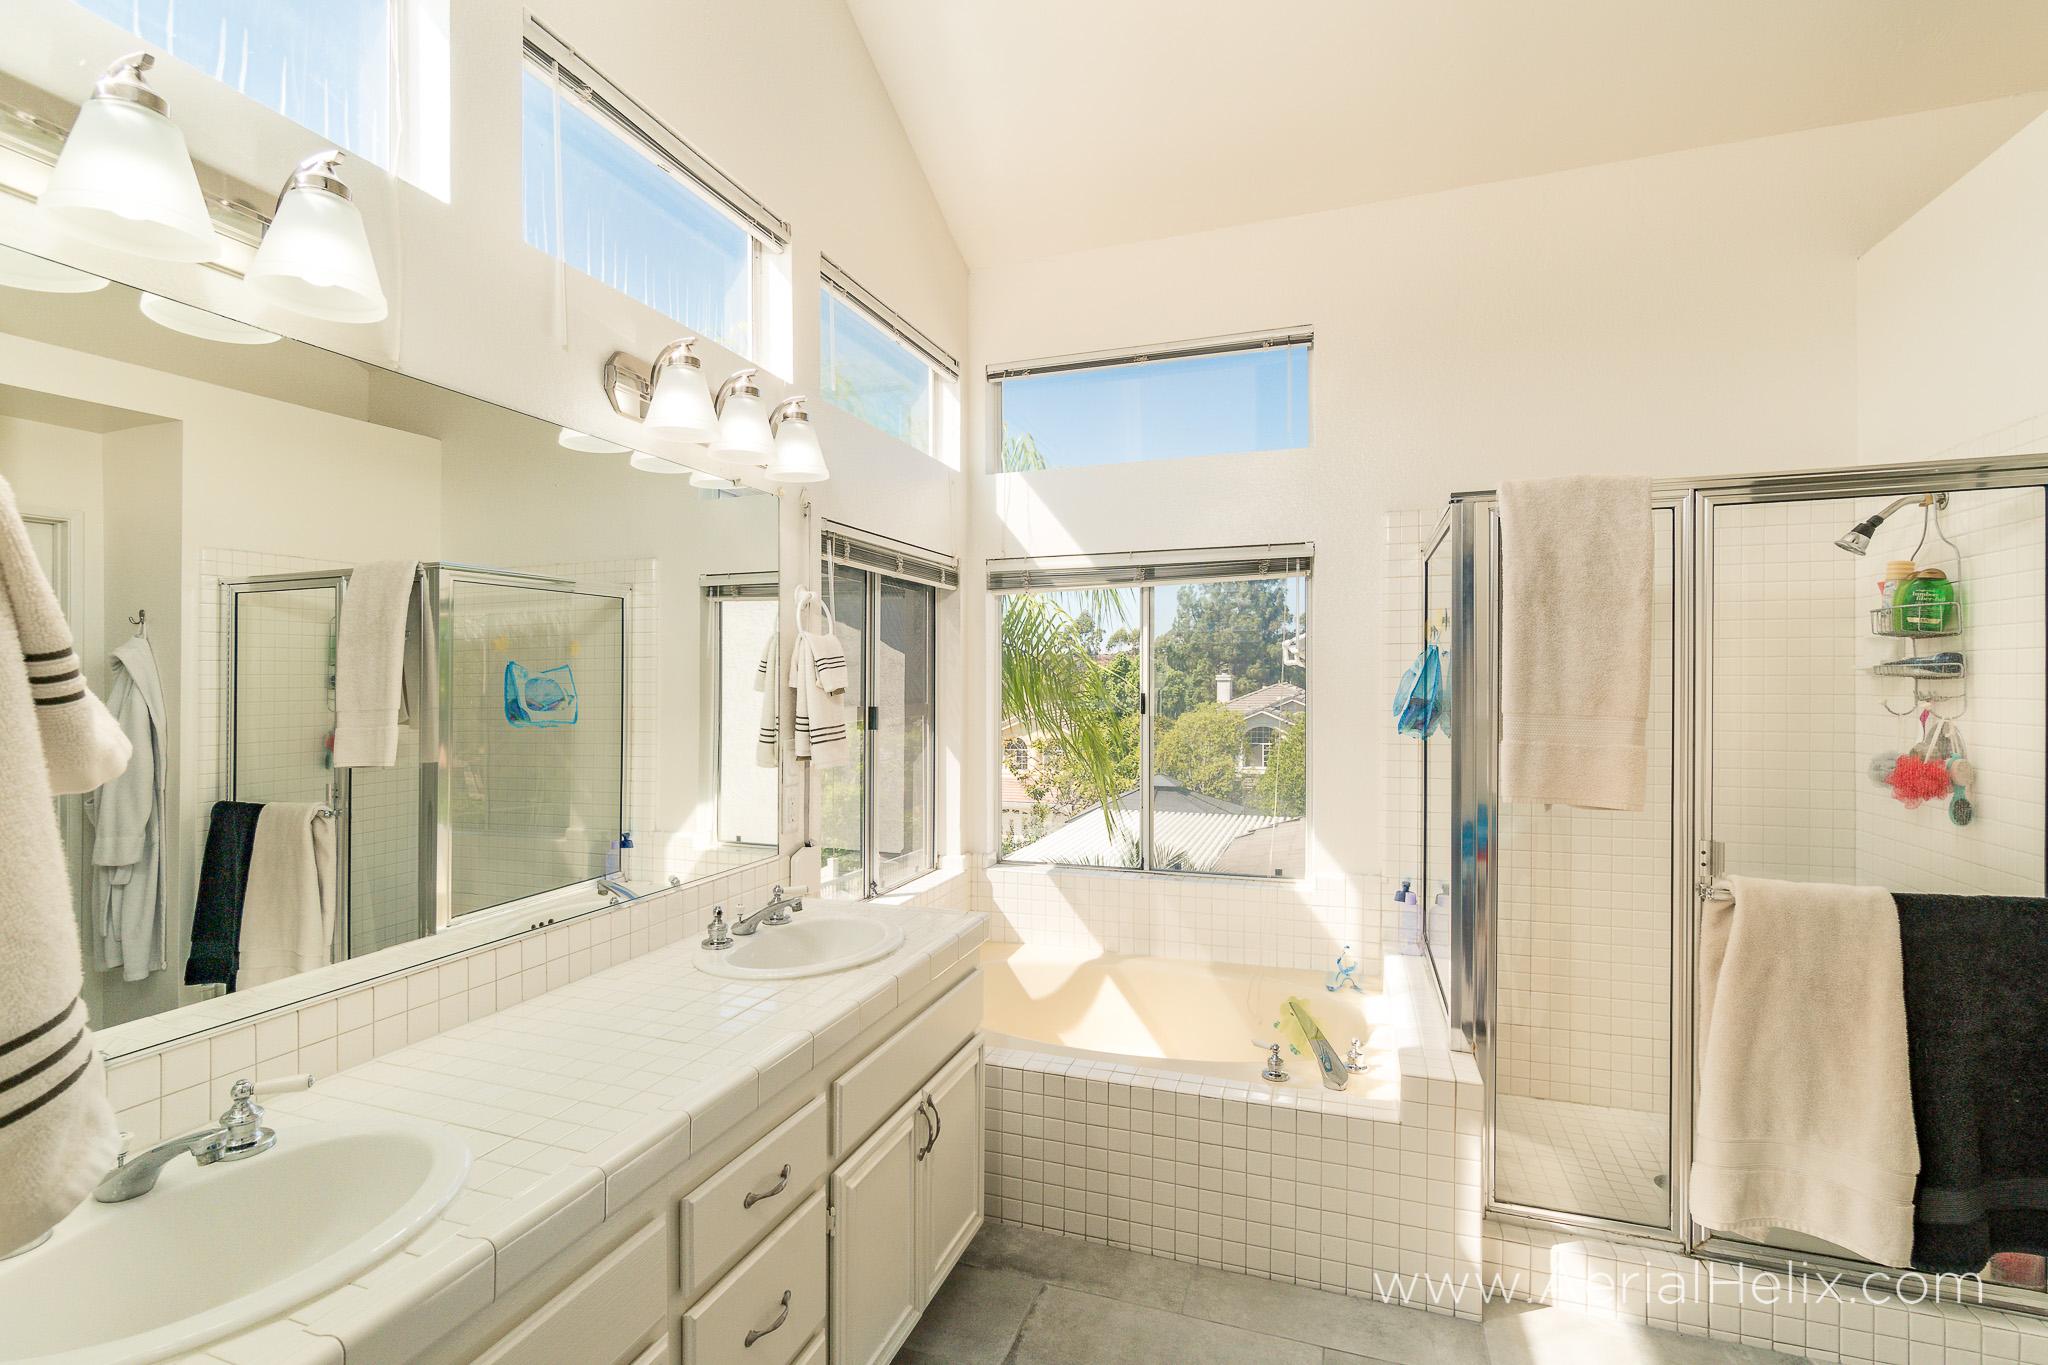 HELIX - Camino Playa Portofino  - Real Estate Photographer-13.jpg